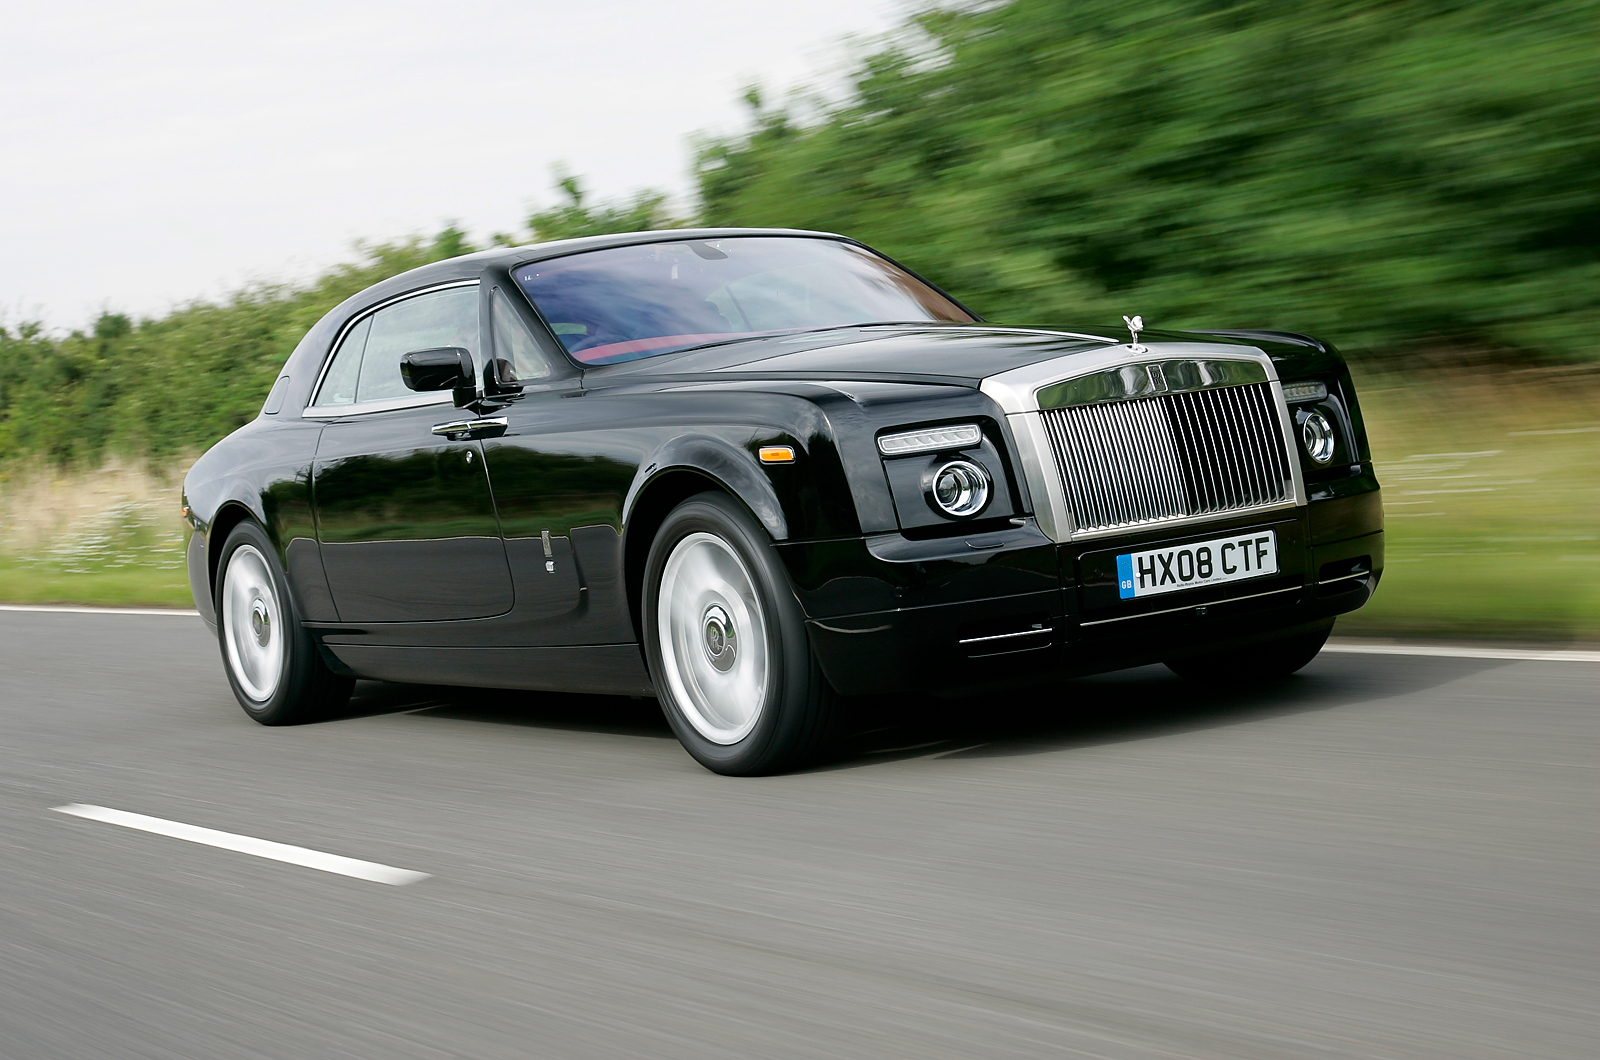 Hd cars wallpapers rolls royce phantom - Royal royce car wallpaper ...